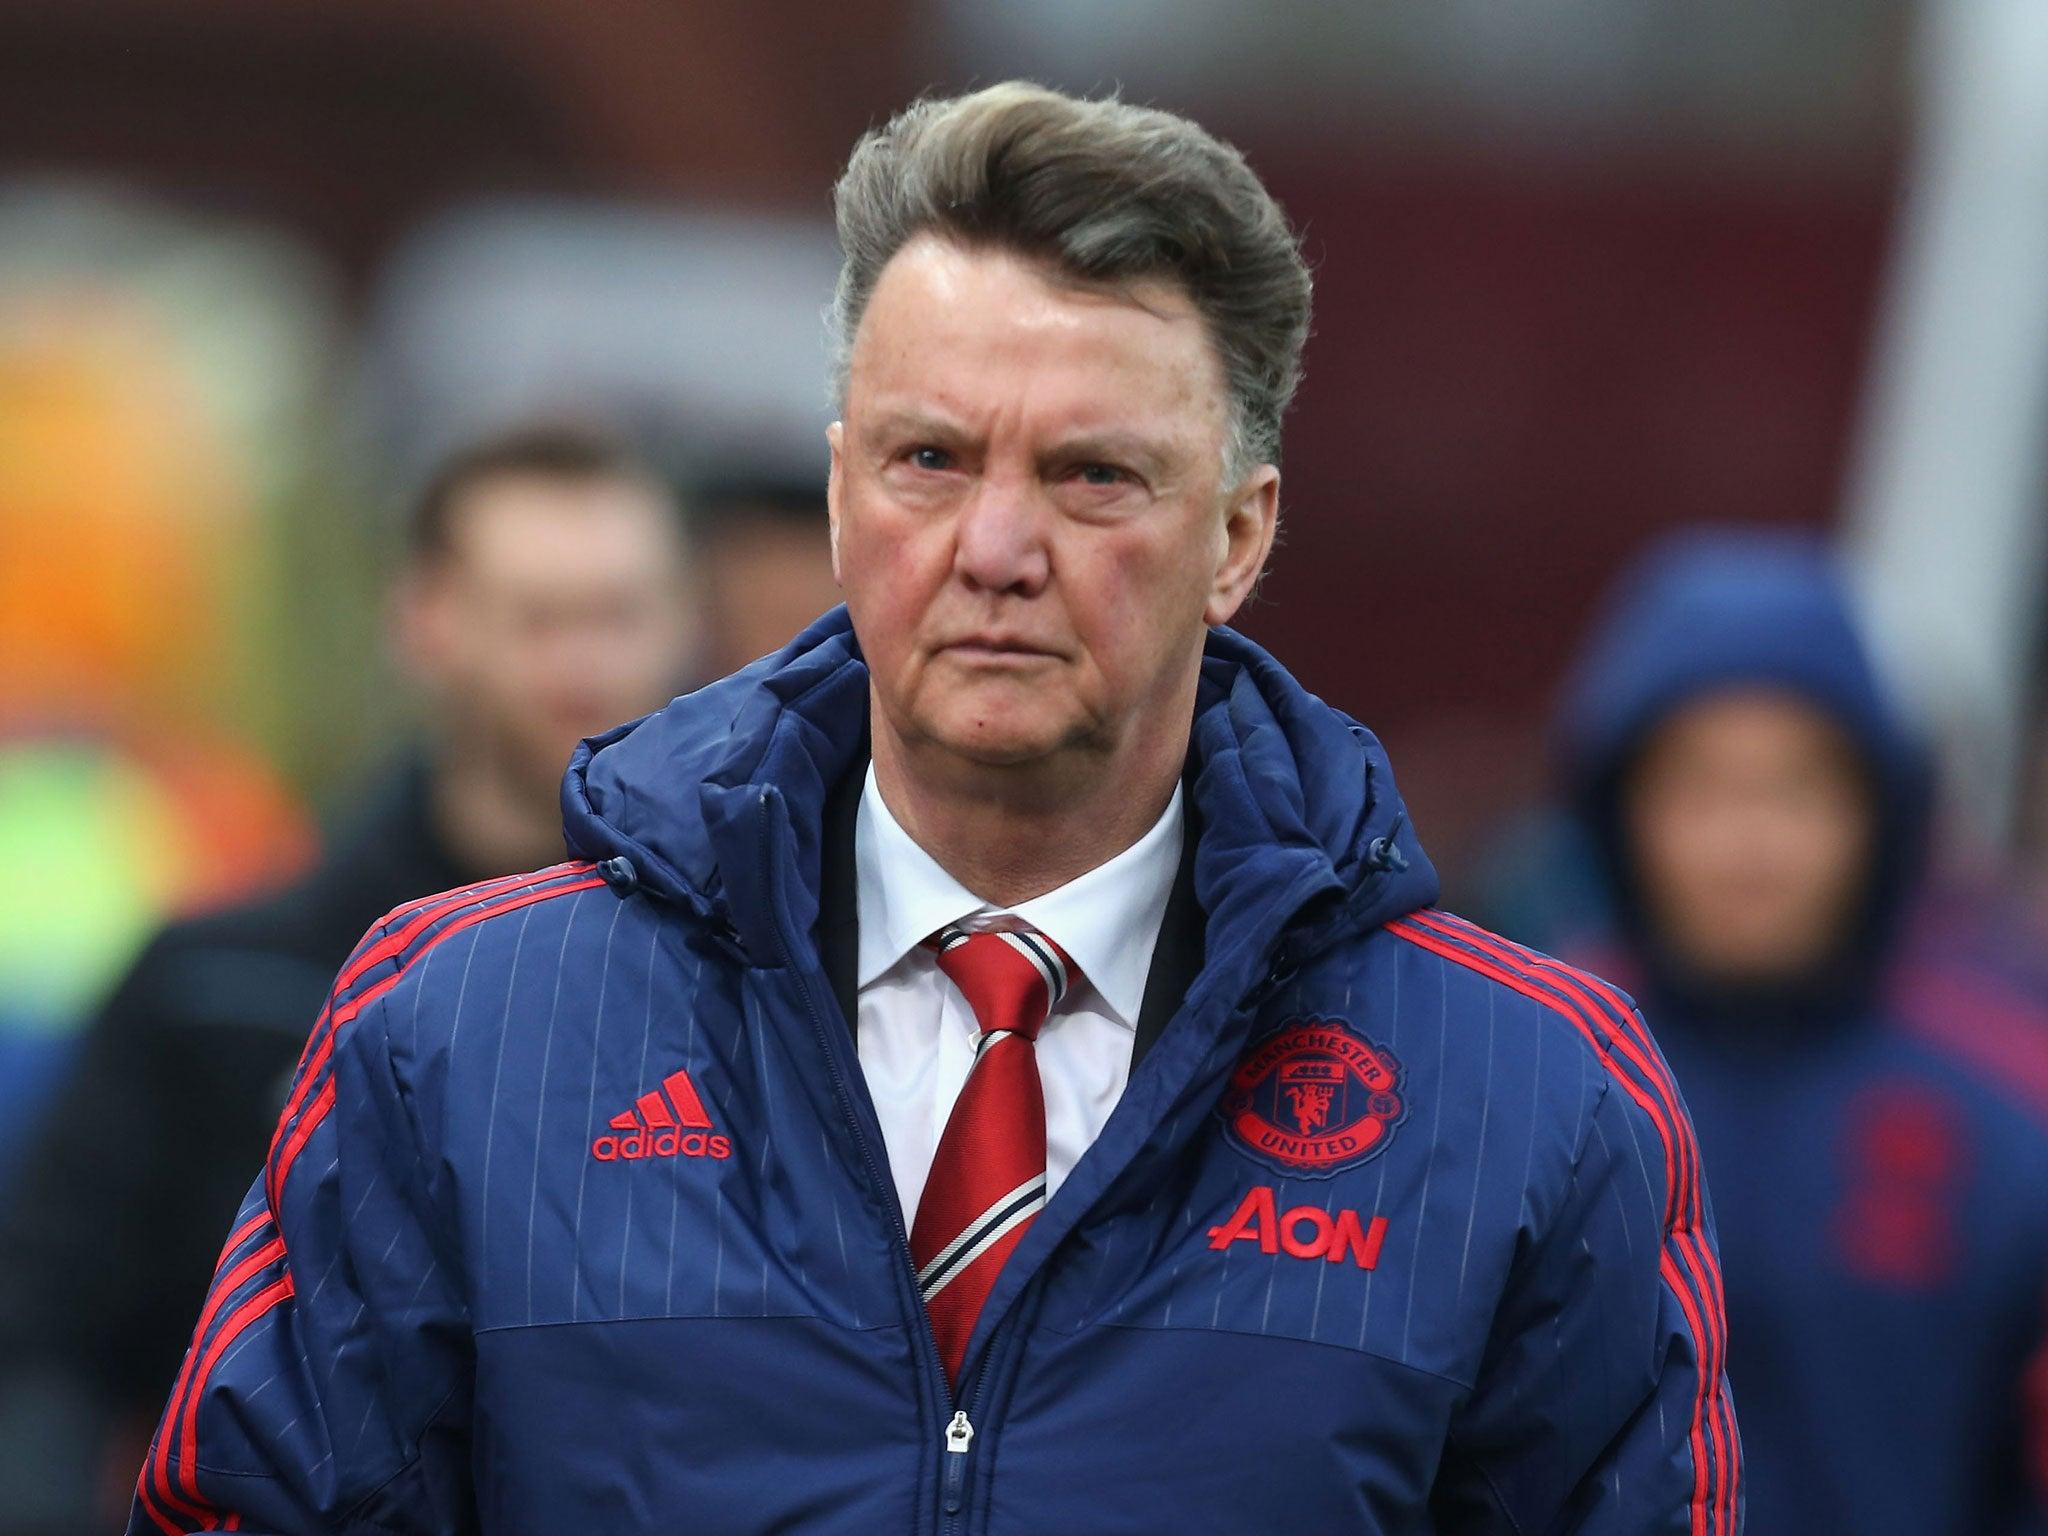 Louis Van Gaal Hints He Could Resign Before He Is Sacked